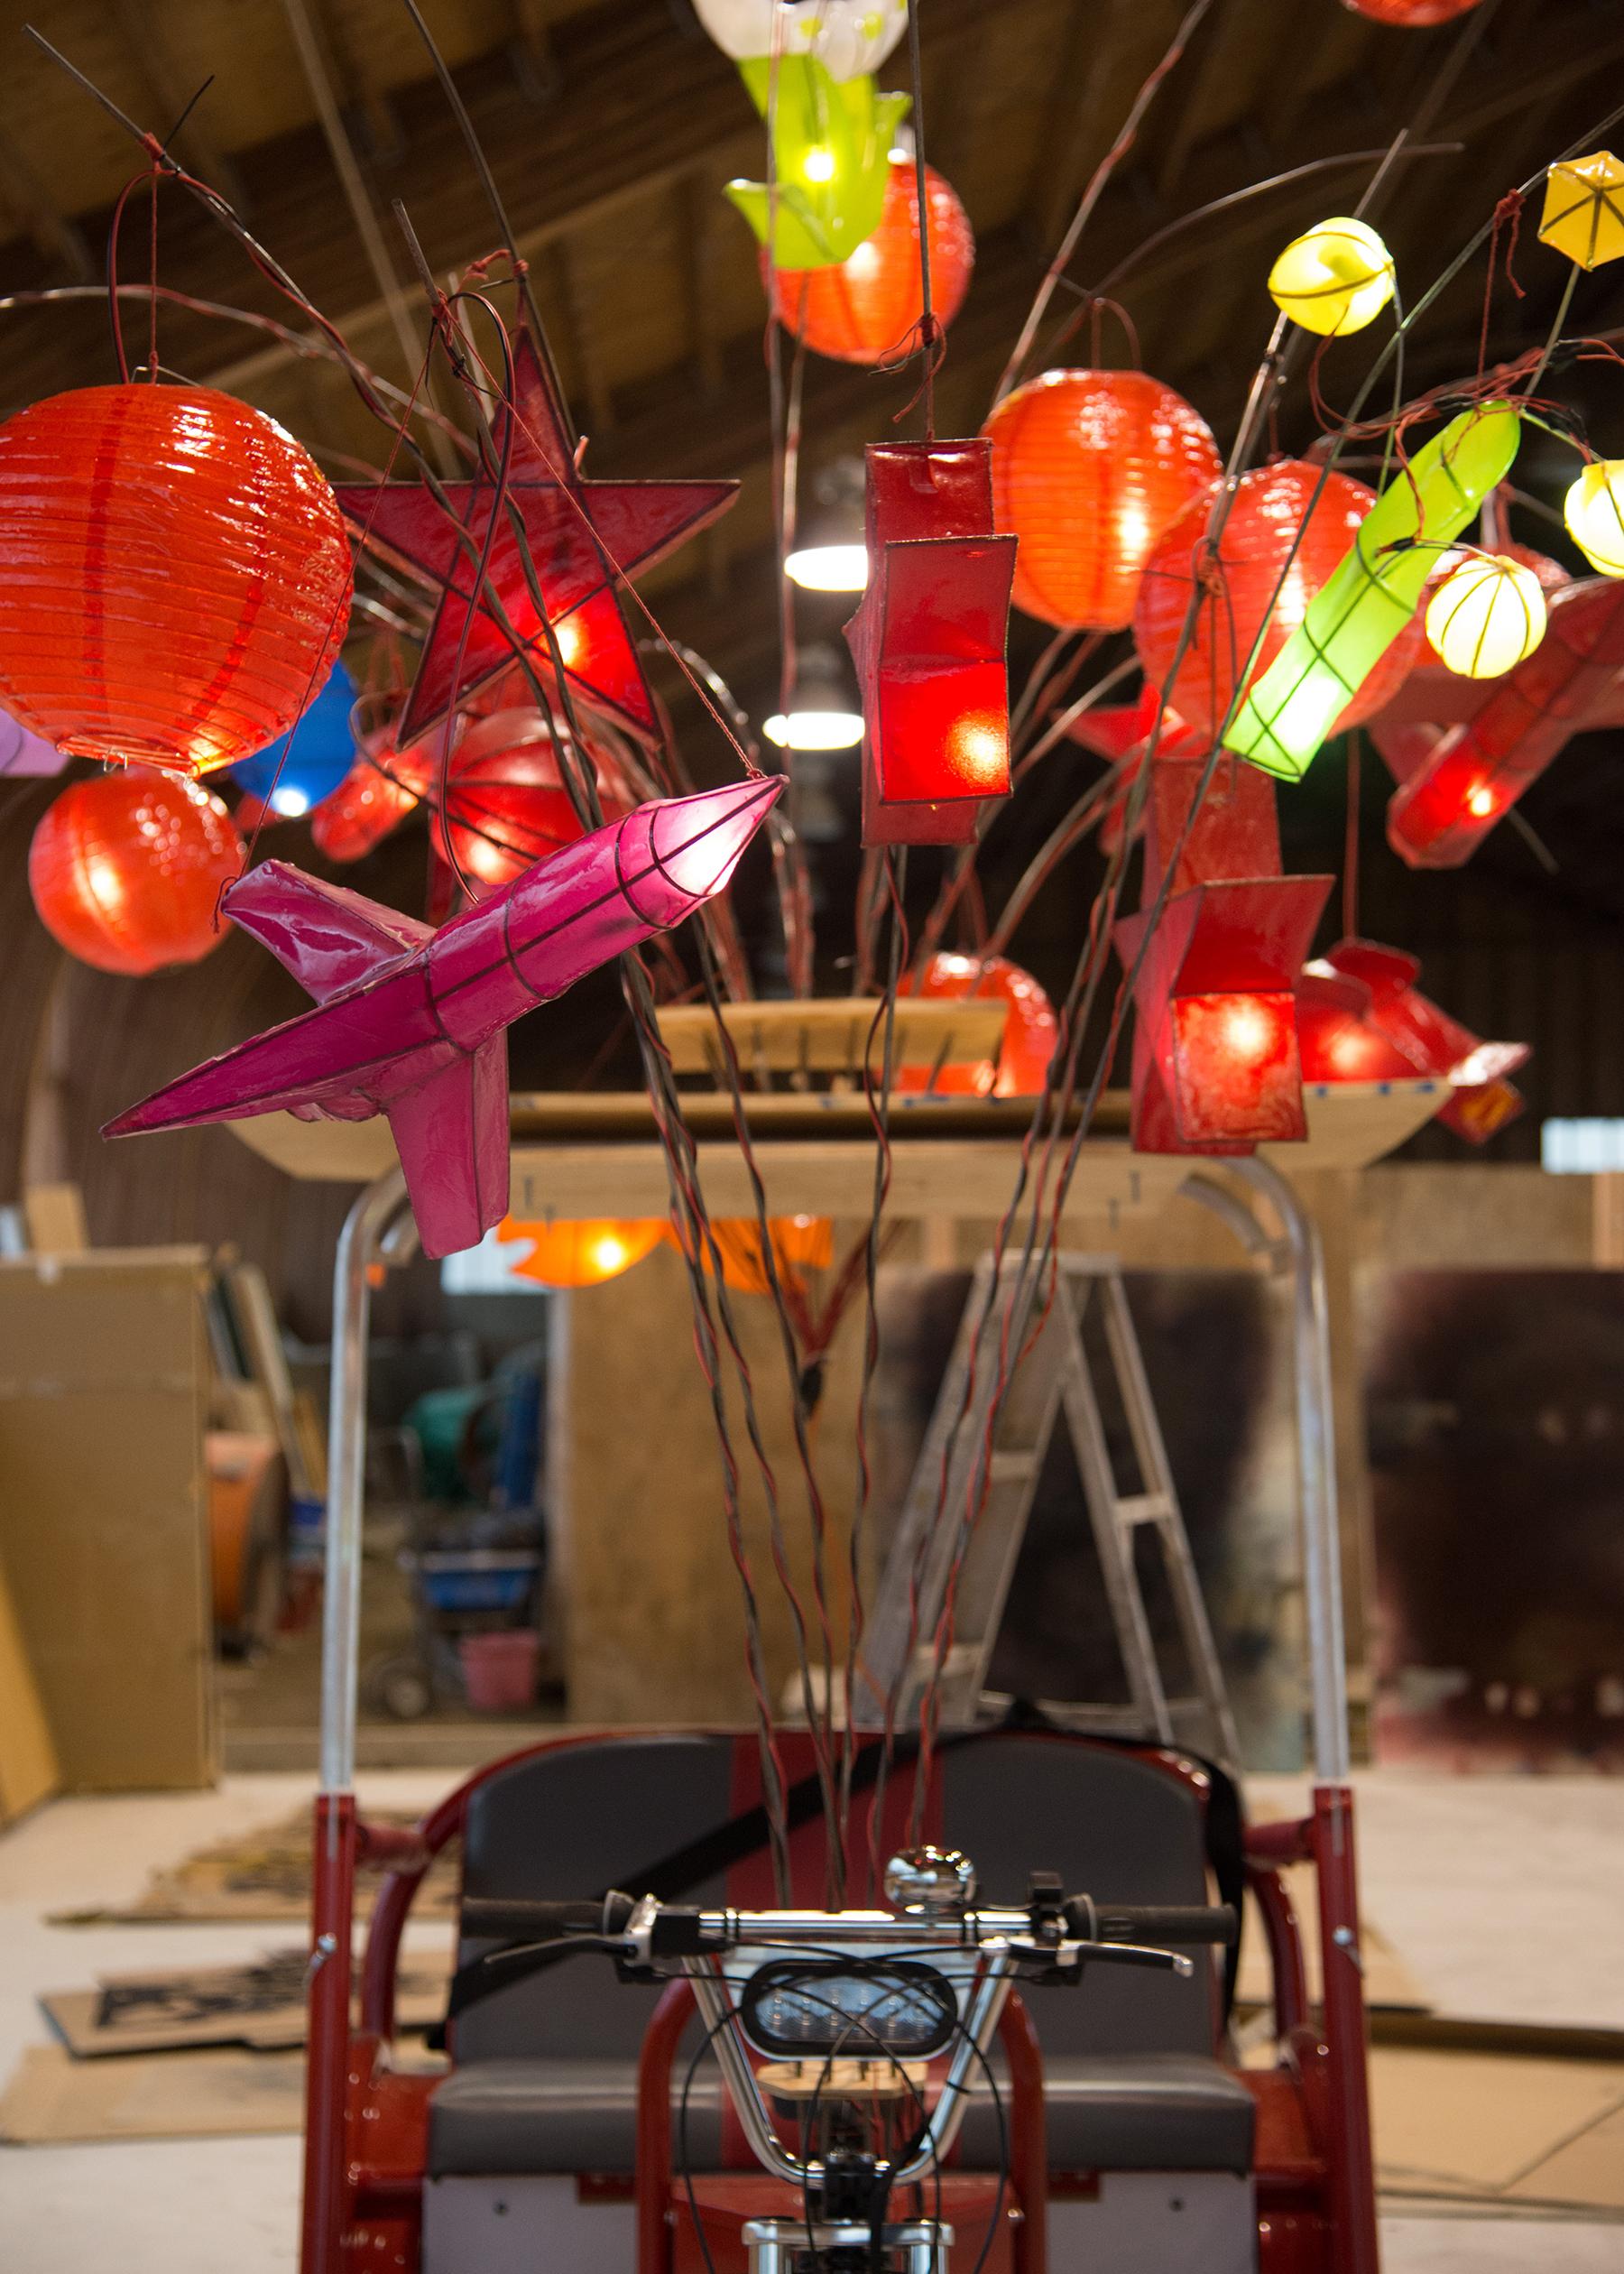 Cai Guo-Qiang Philadelphie Tuk Tuk Lanterne Fireflies USA Chine Artiste Brève Transports Lumières